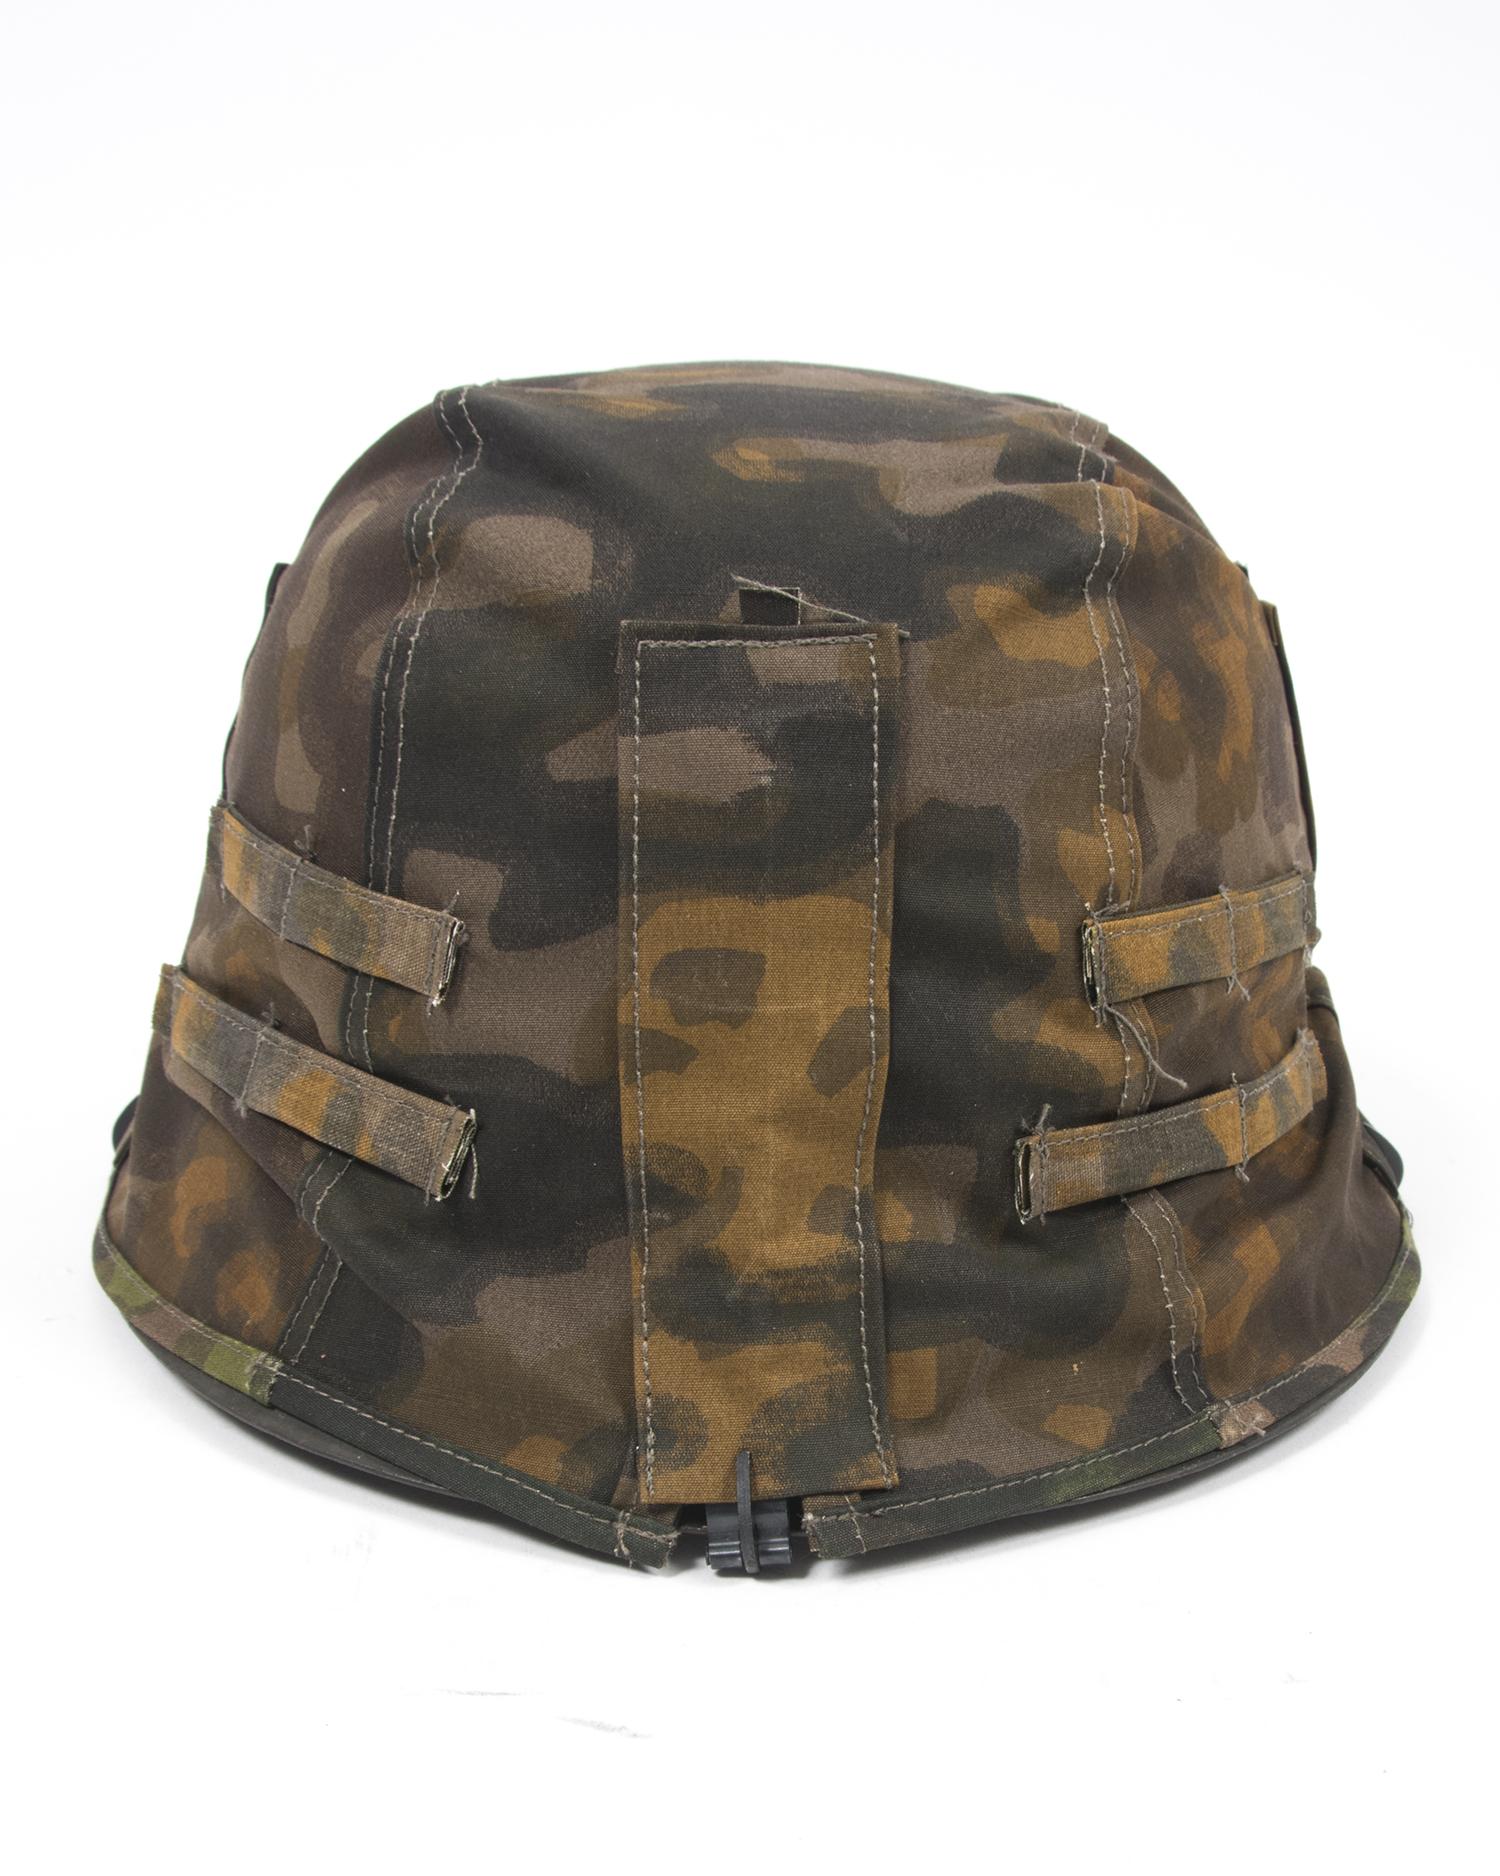 M43 Blurred Edge Helmet Cover